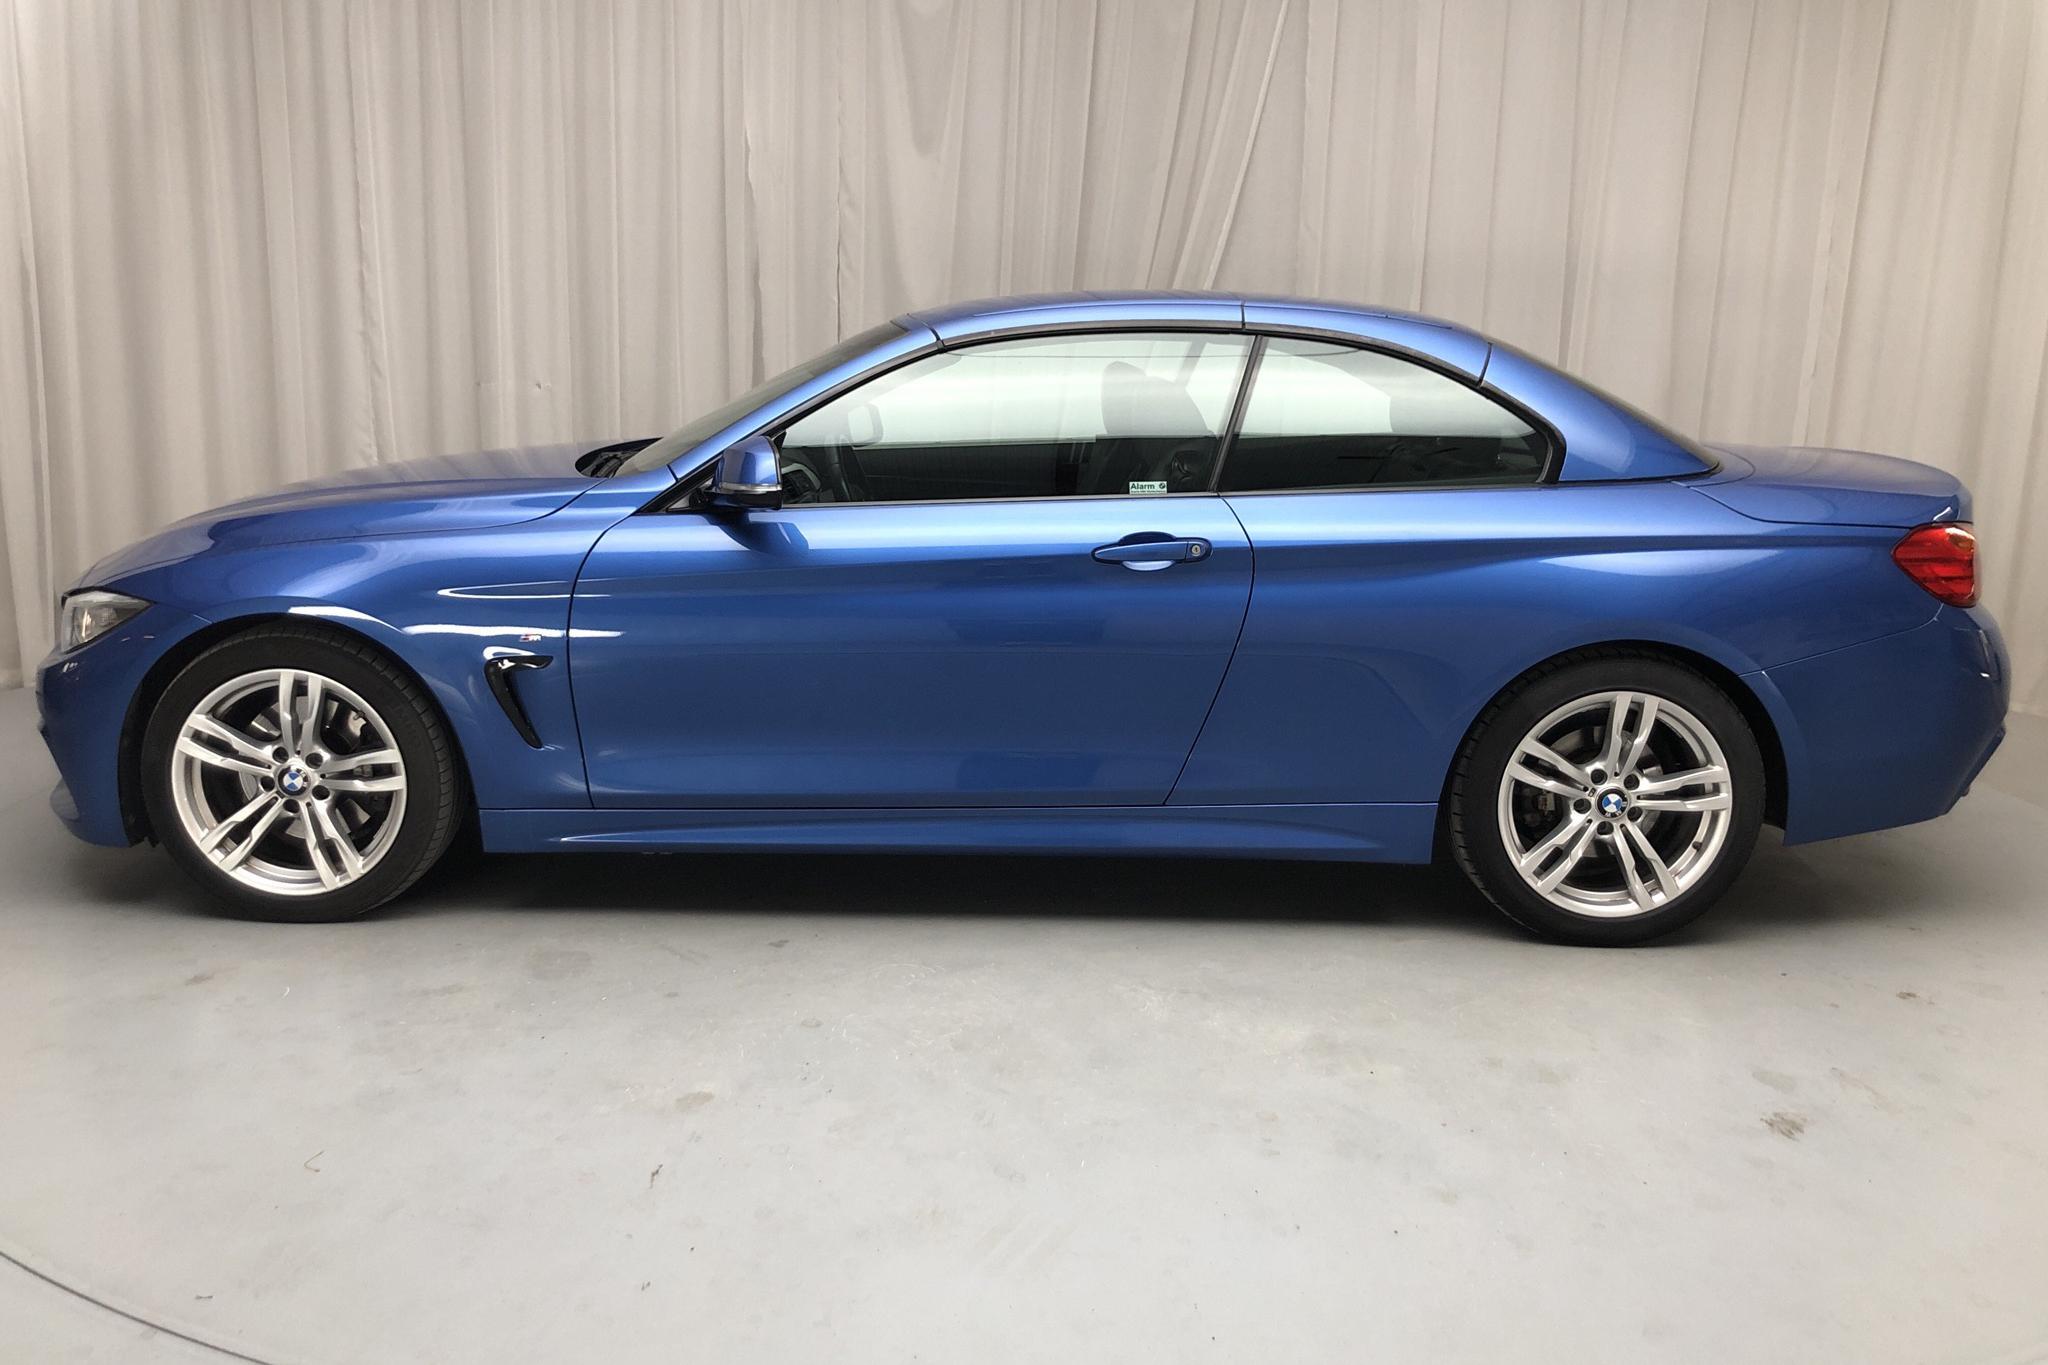 BMW 428i Cabriolet, F33 (245hk) - 87 700 km - Automatic - blue - 2014